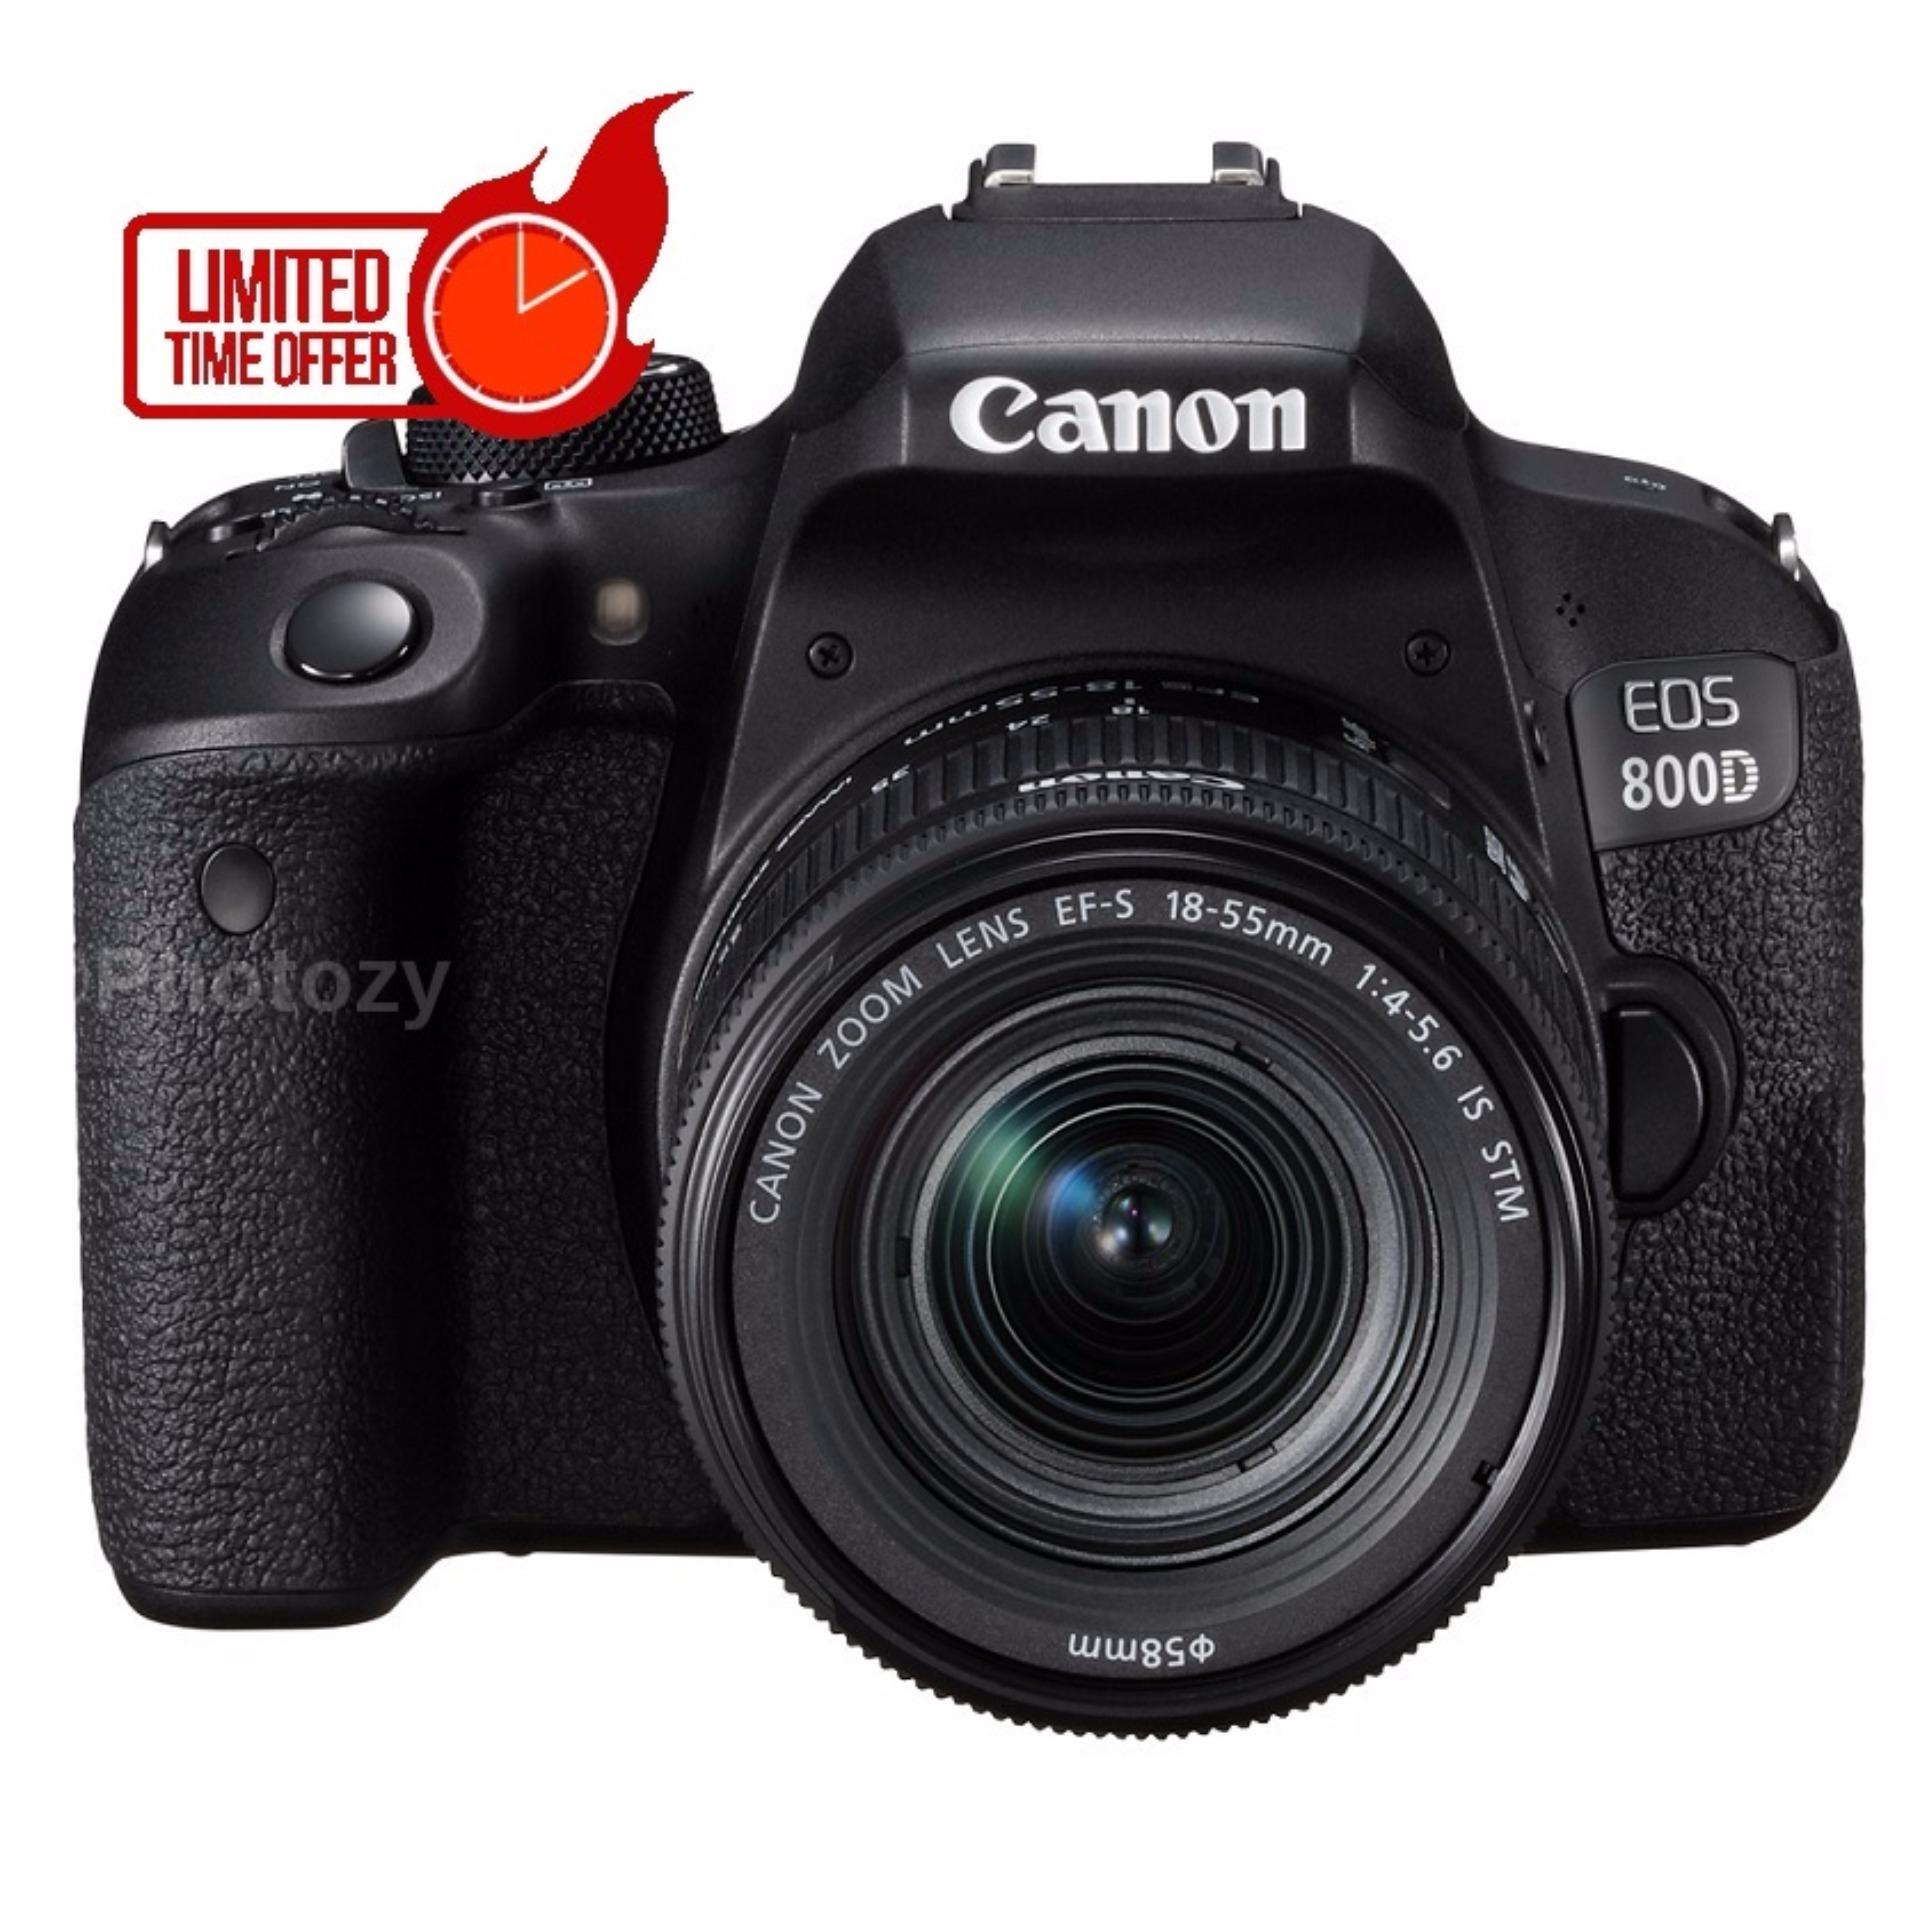 [NEW MODEL] Canon EOS 800D + EF-S 18-55mm IS STM Lens